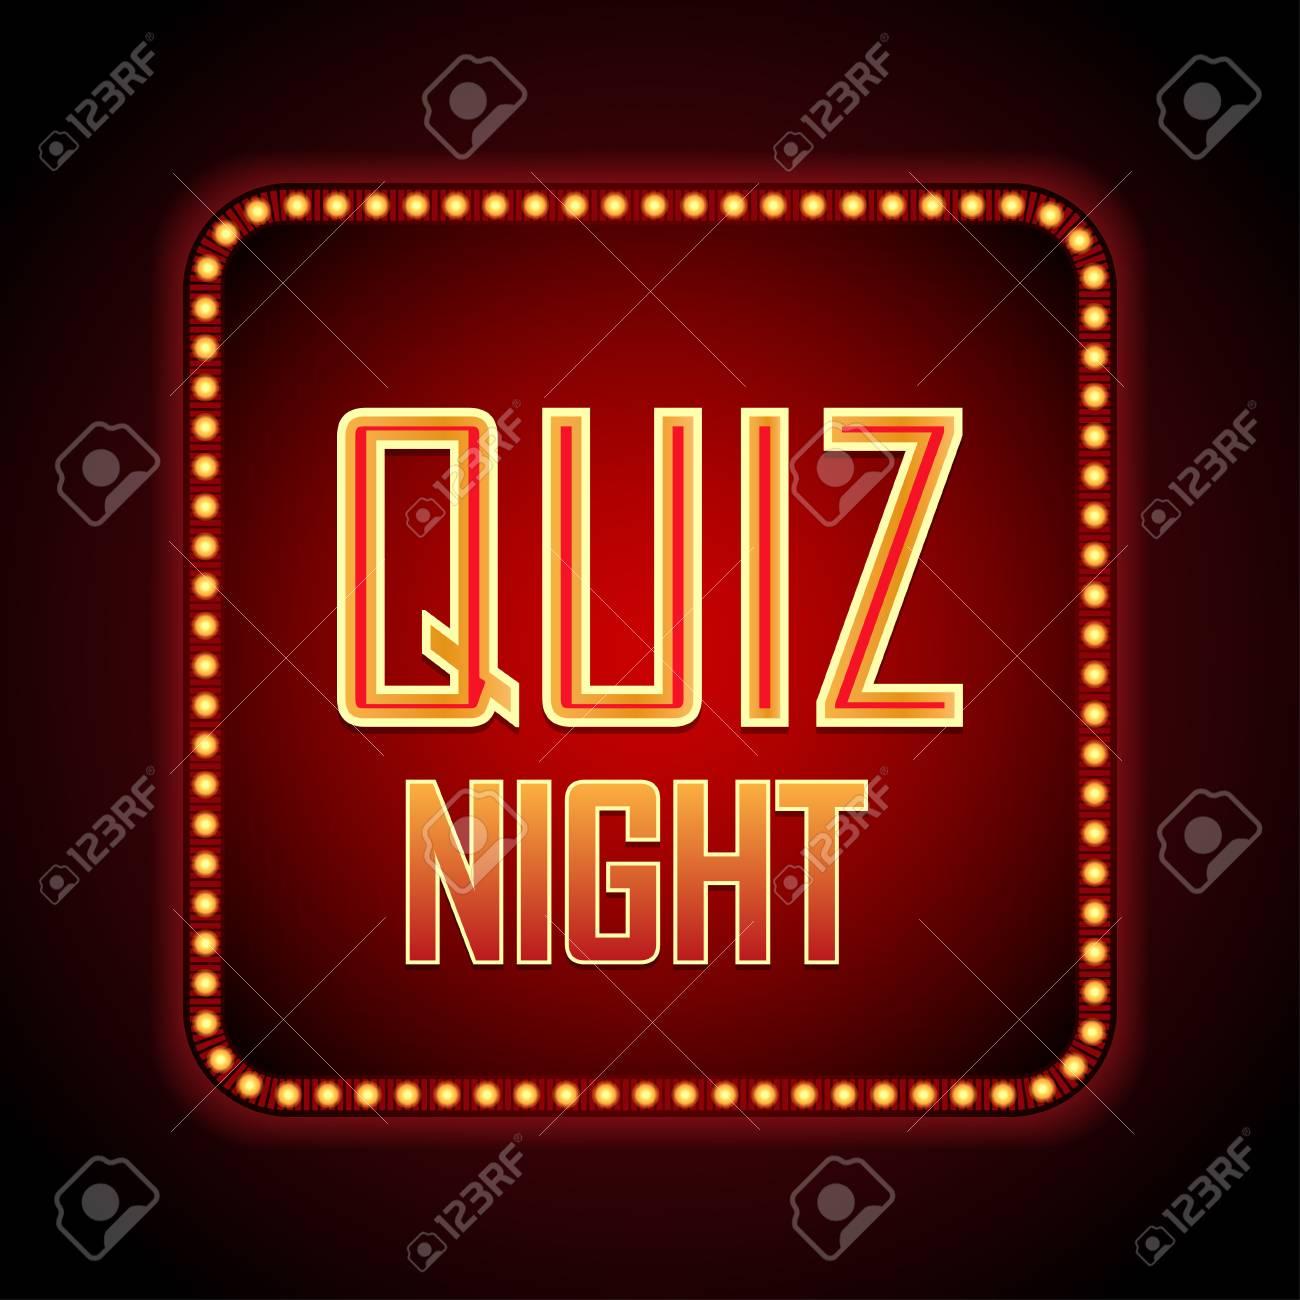 Quiz night announcement poster design web banner background. Vector illustration. - 96850404